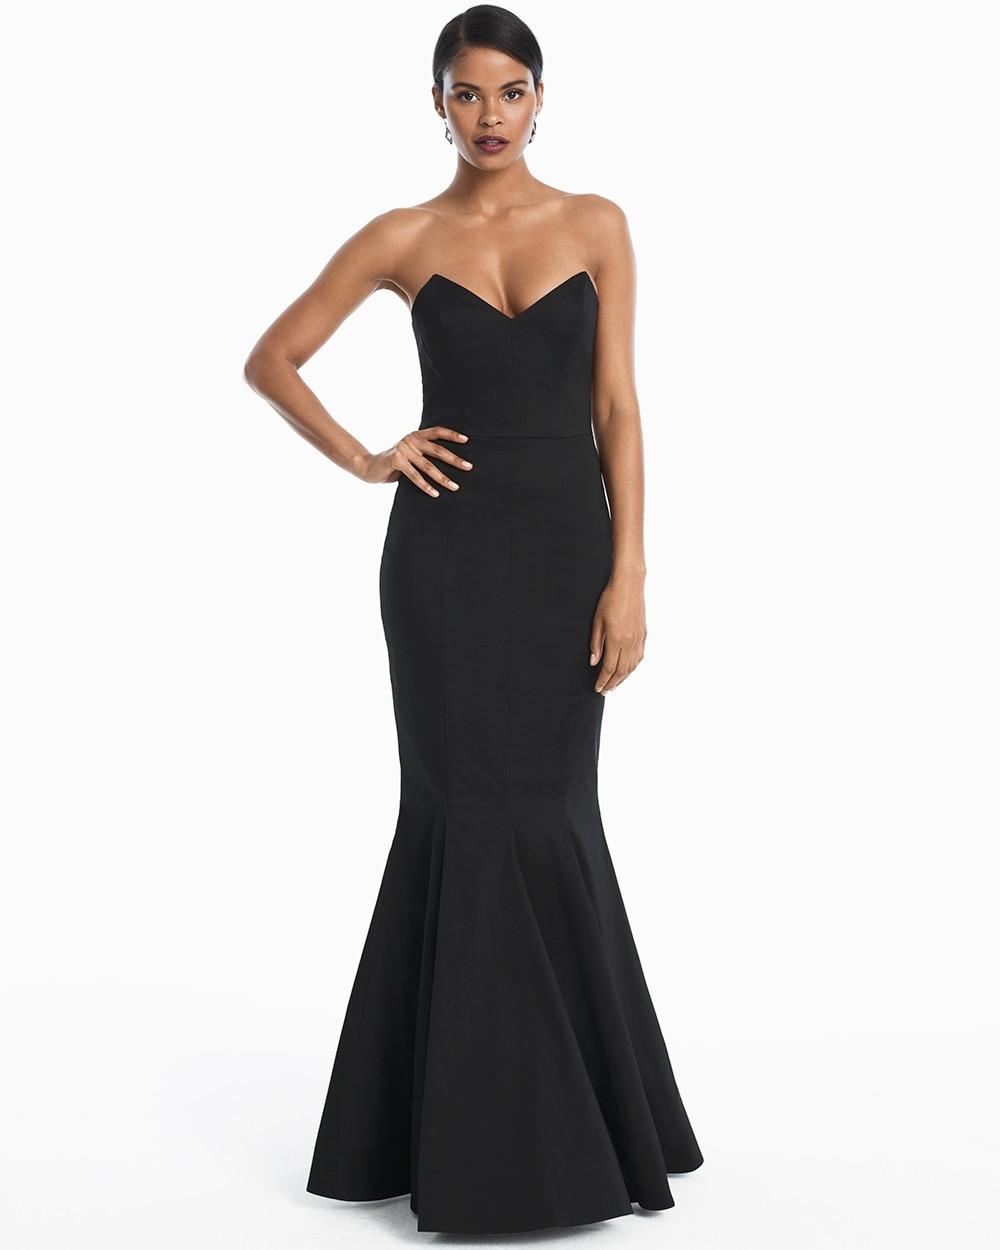 Black Strapless Mermaid Gown - White House Black Market